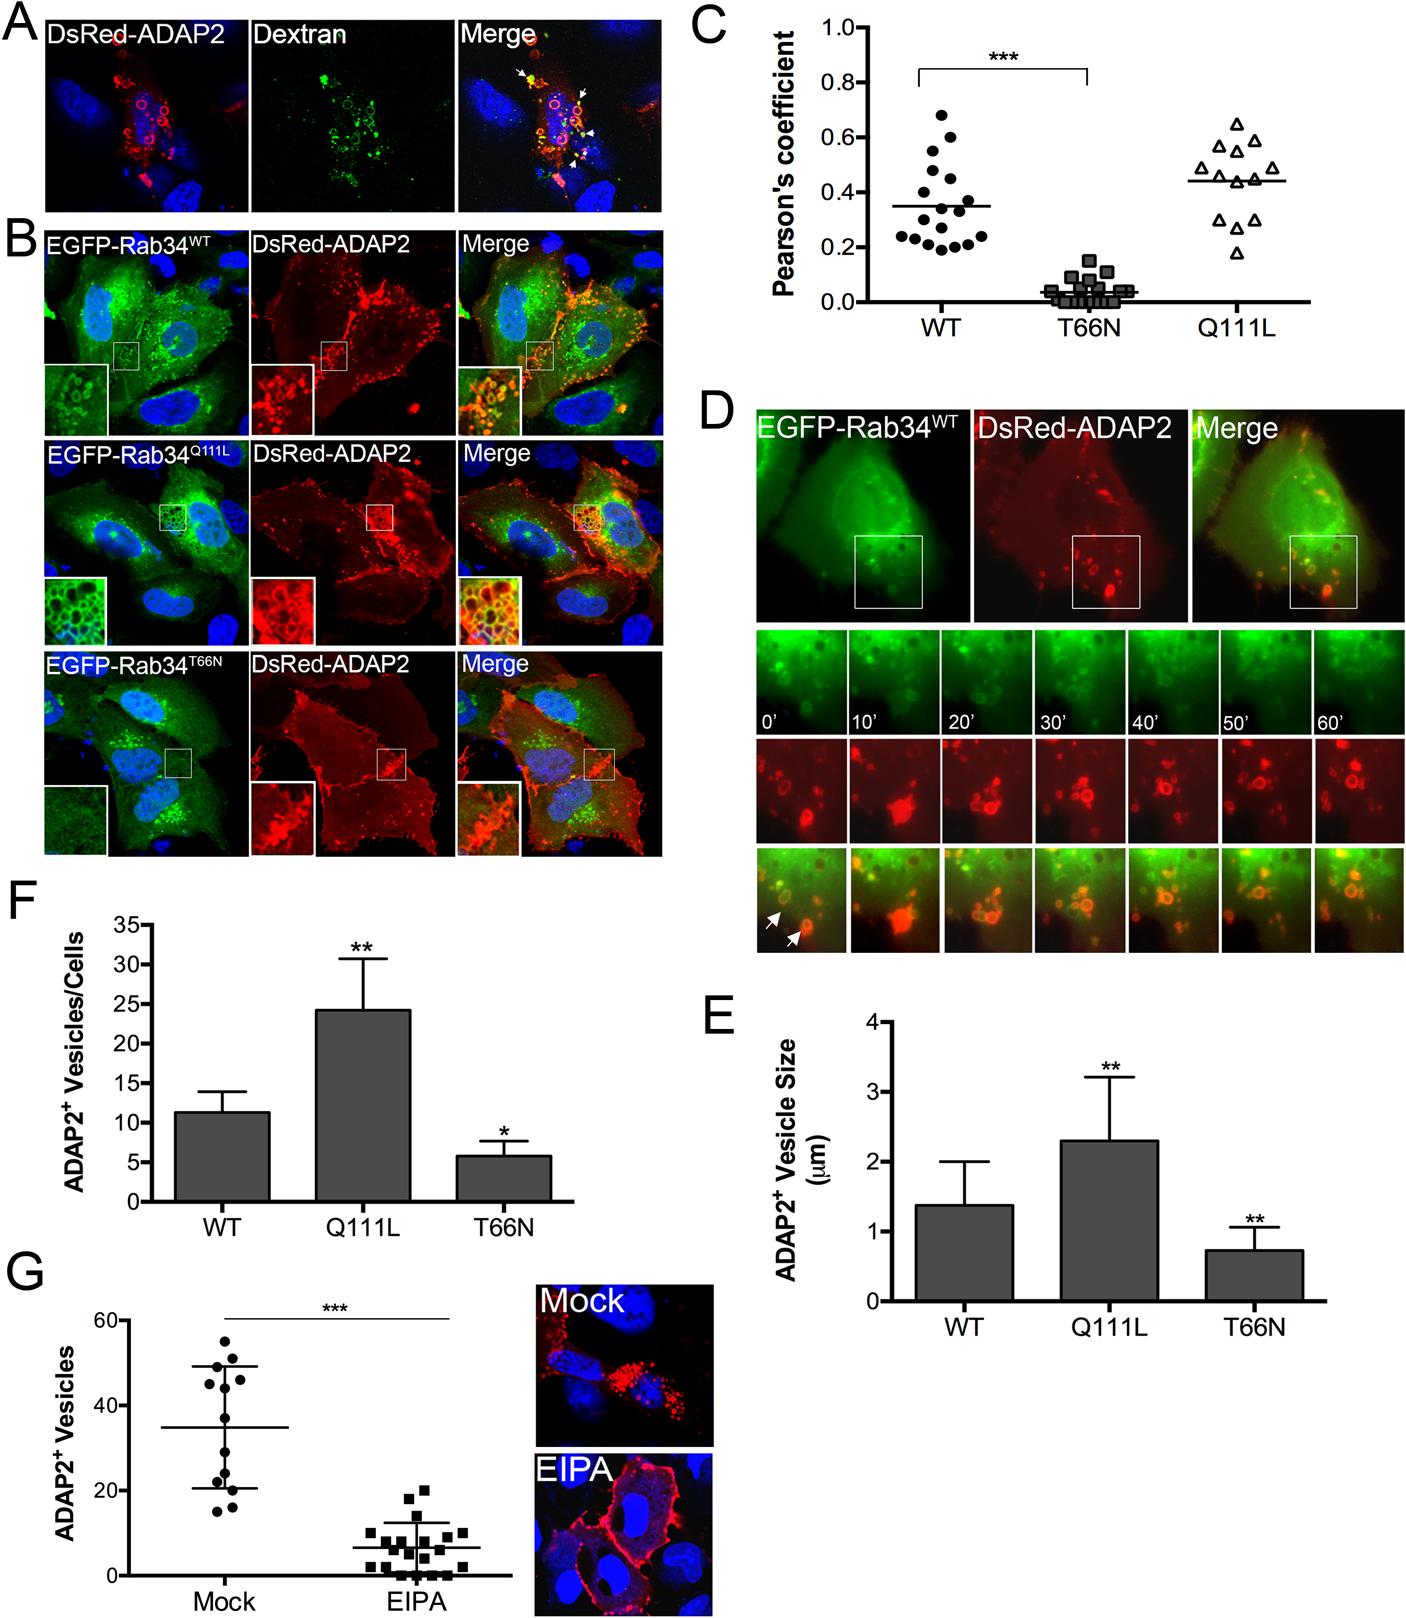 ADAP2 induces macropinocytosis and associates with macropinosomes.